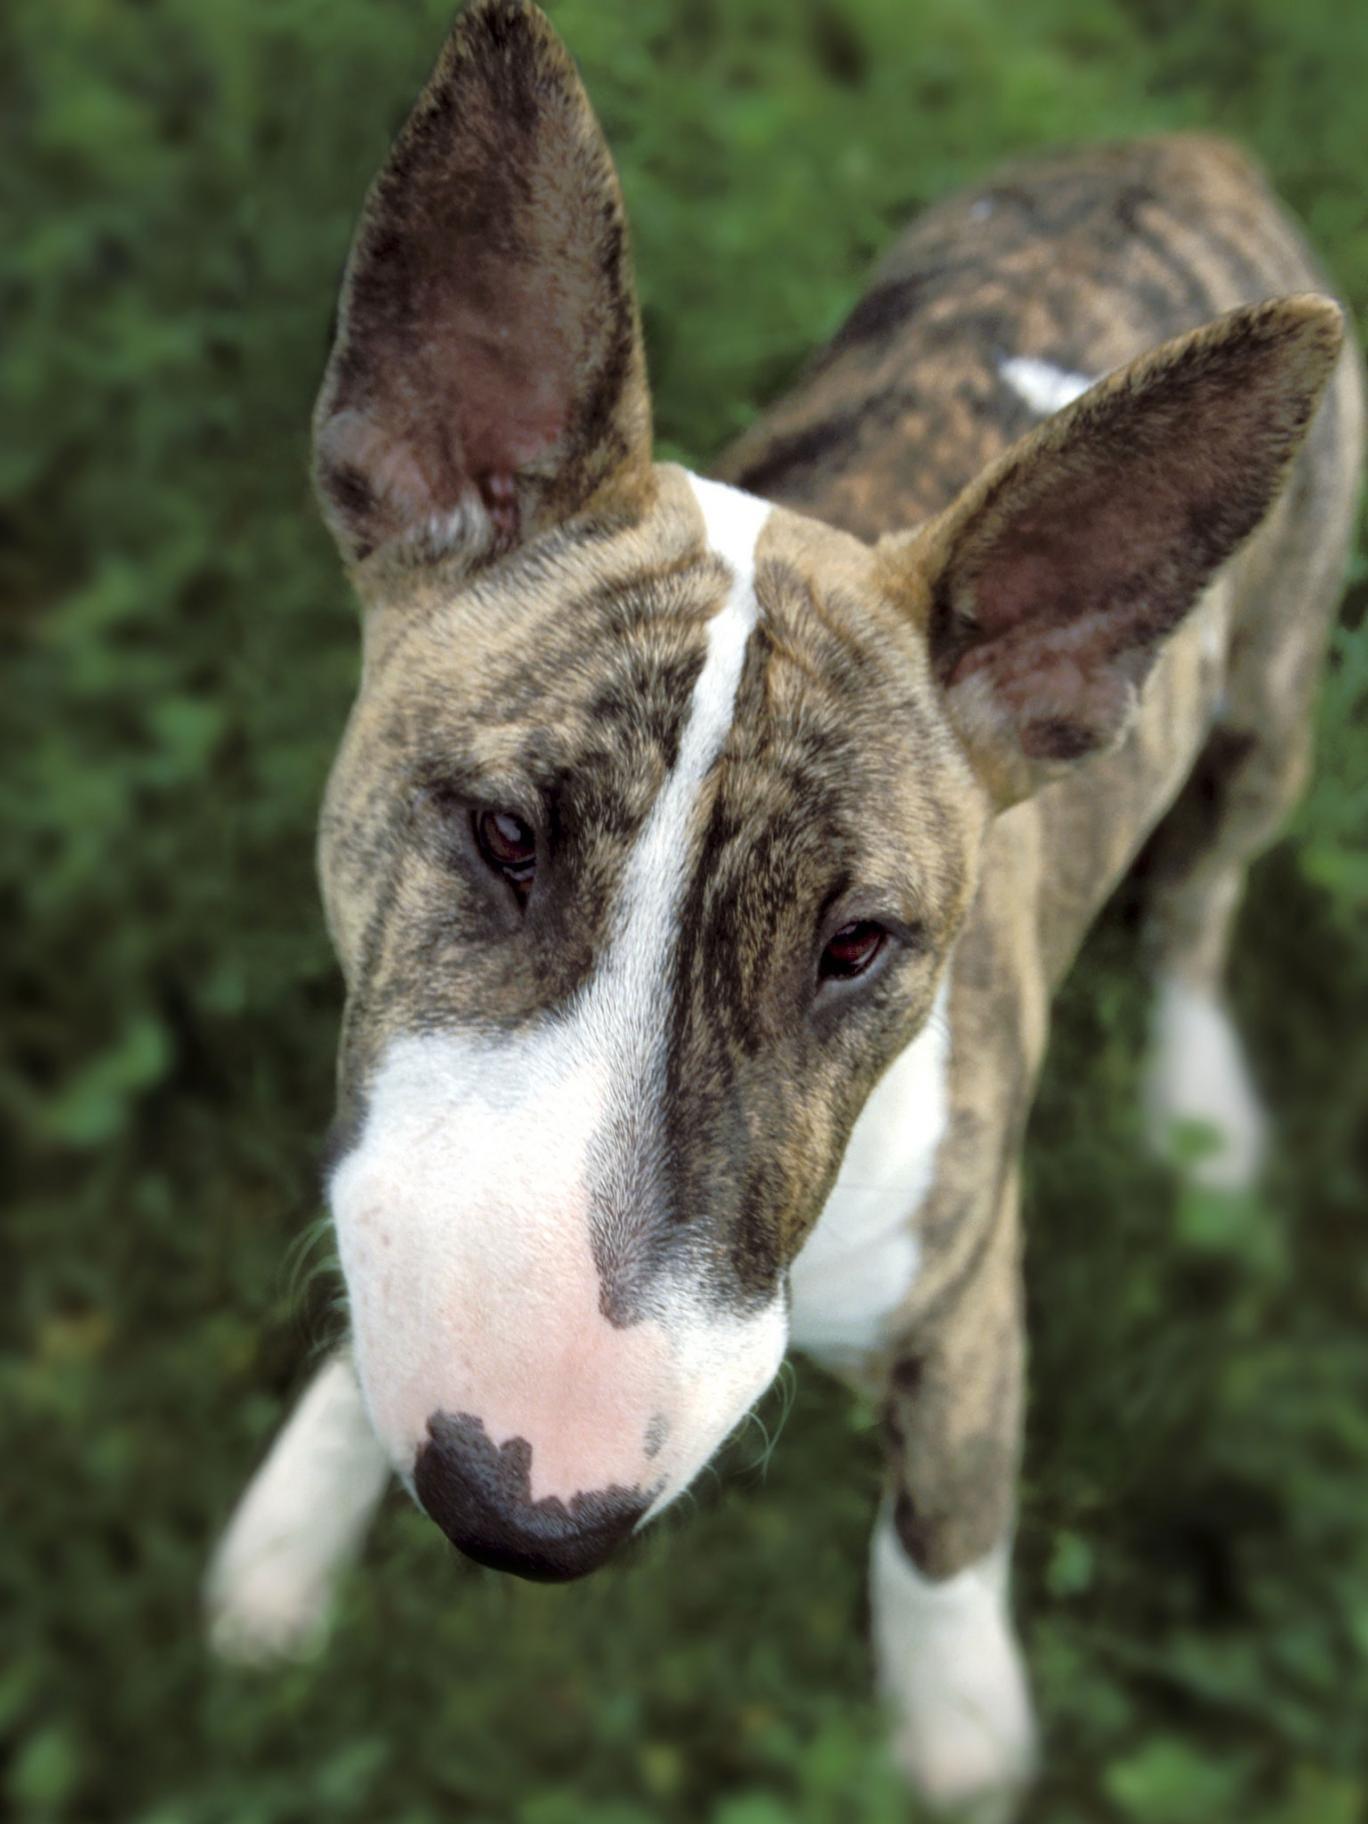 An English Bull Terrier